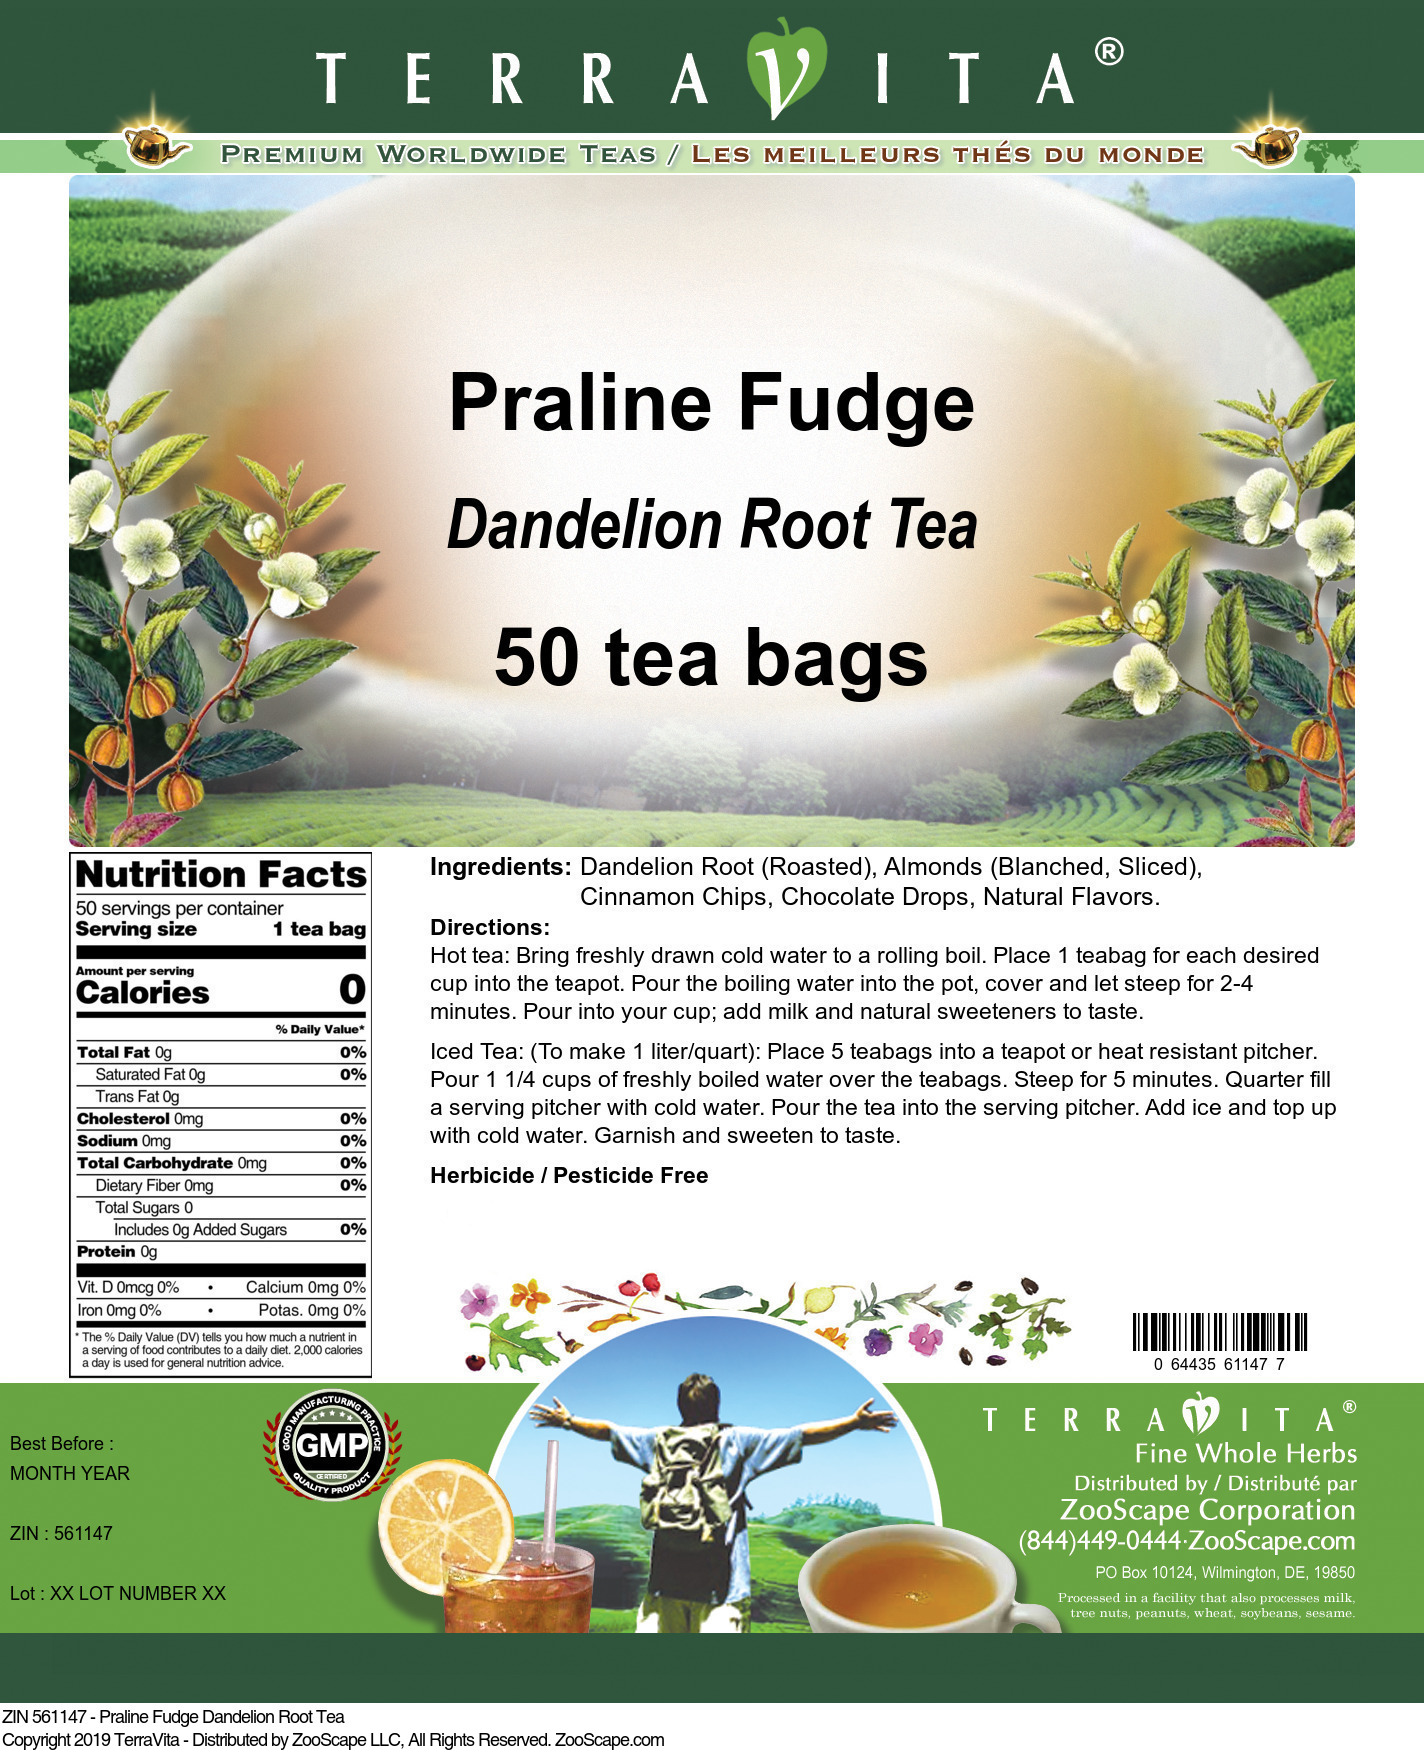 Praline Fudge Dandelion Root Tea